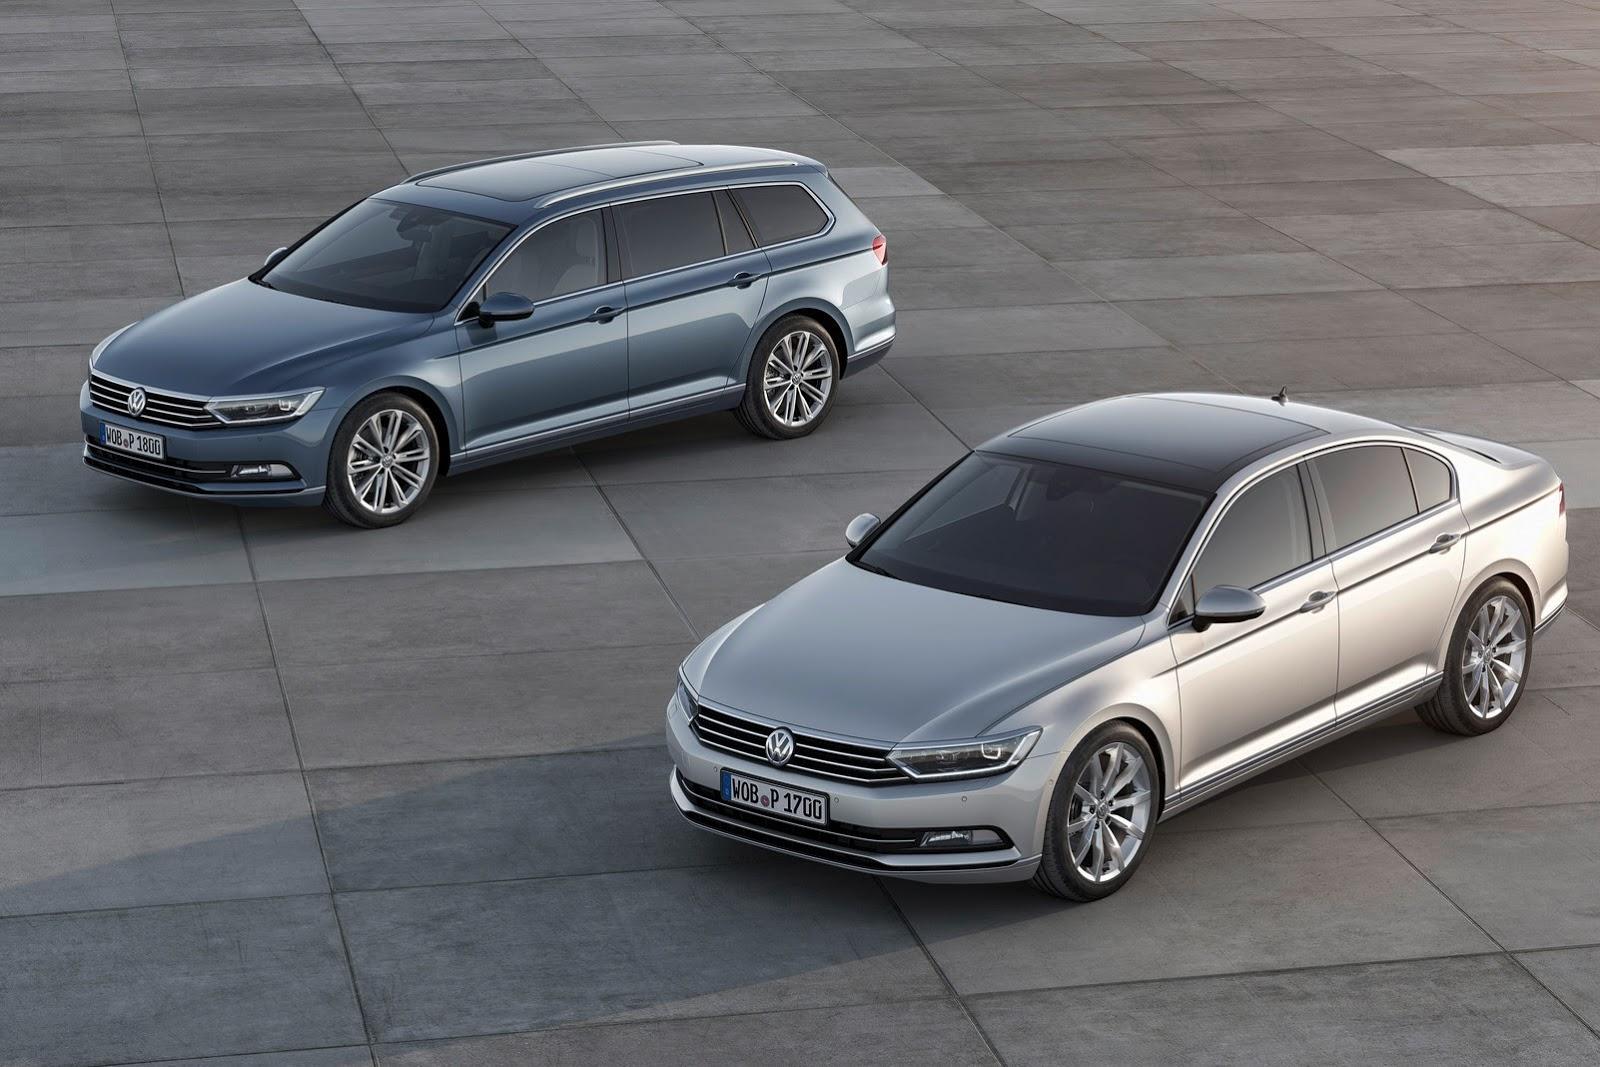 new vw passat 32 Novo VW Passat com motor TDI Biturbo de 240cv